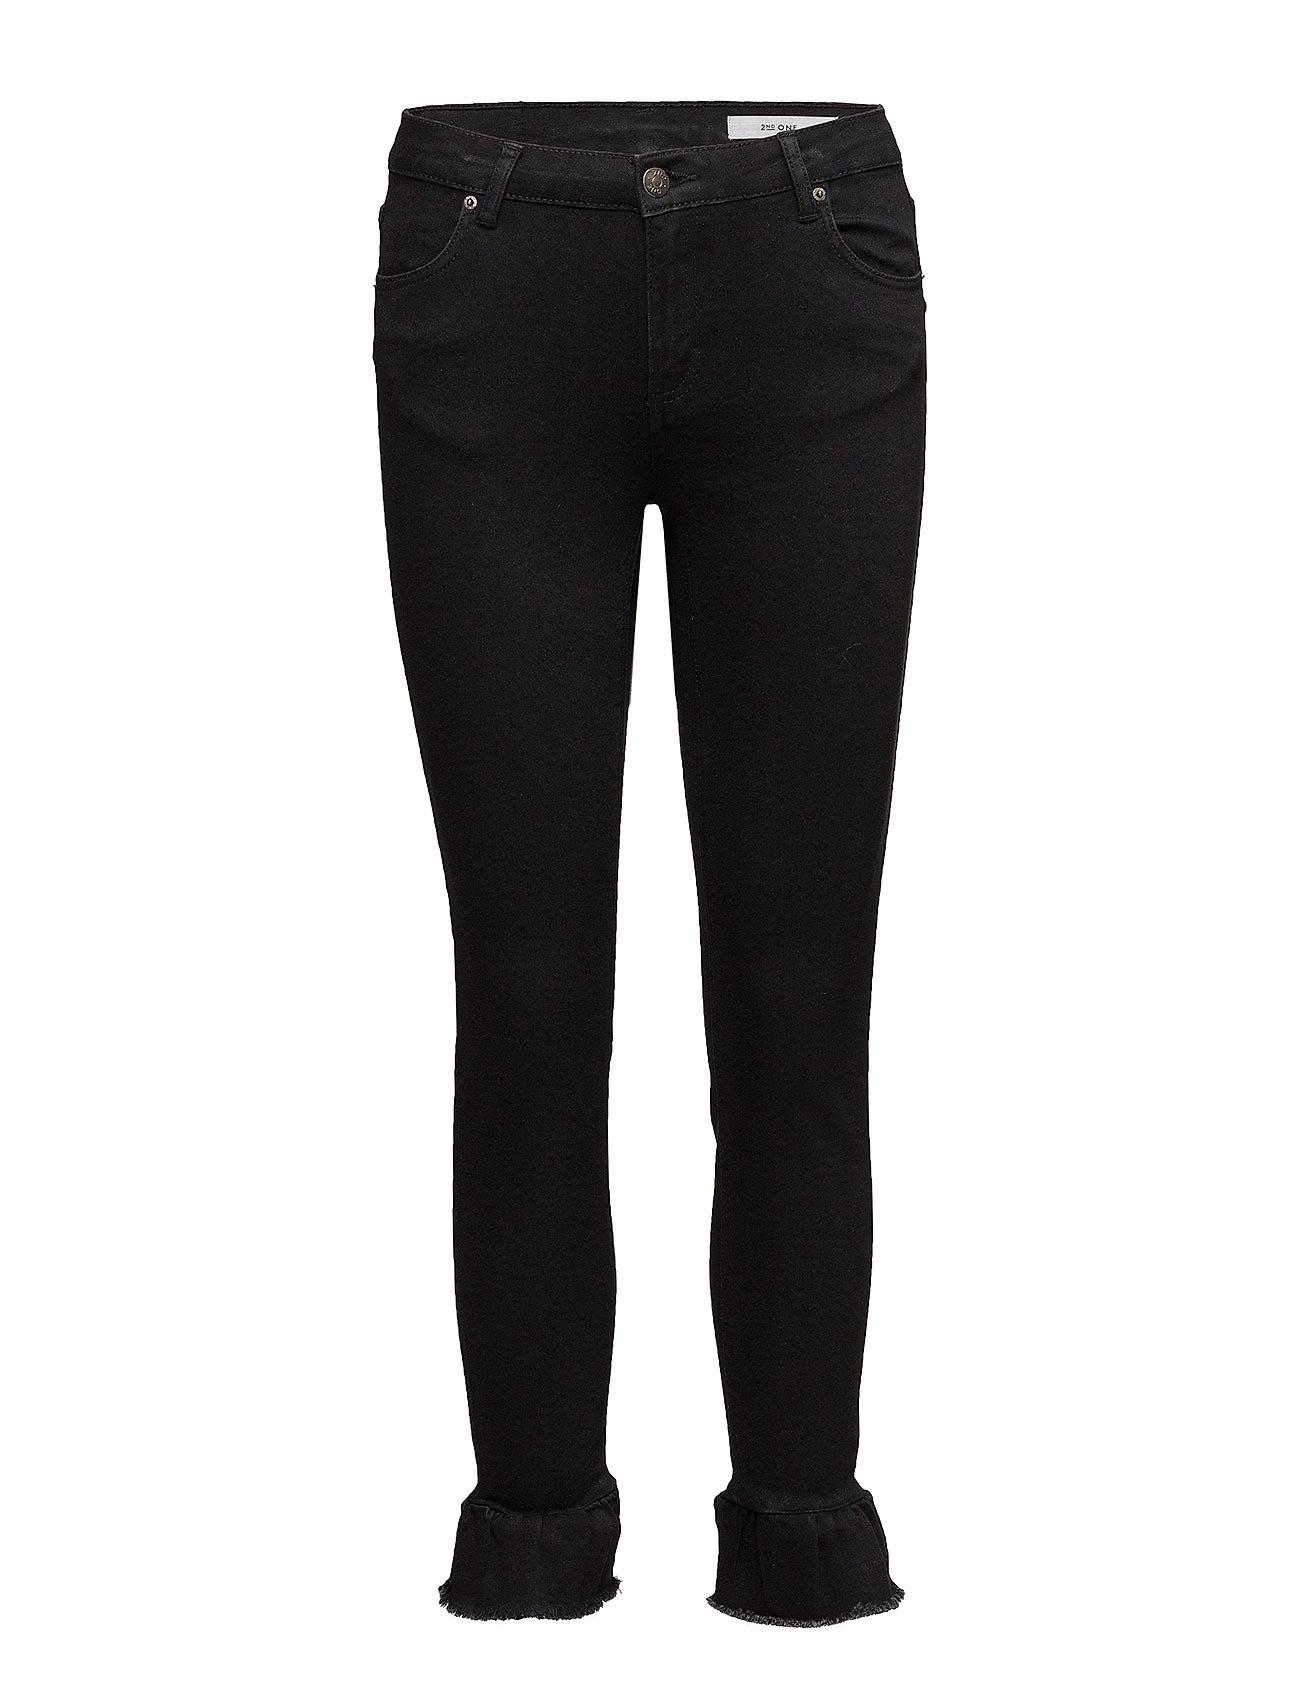 2nd one – Nicole 002 crop, black ruffle, jeans fra boozt.com dk